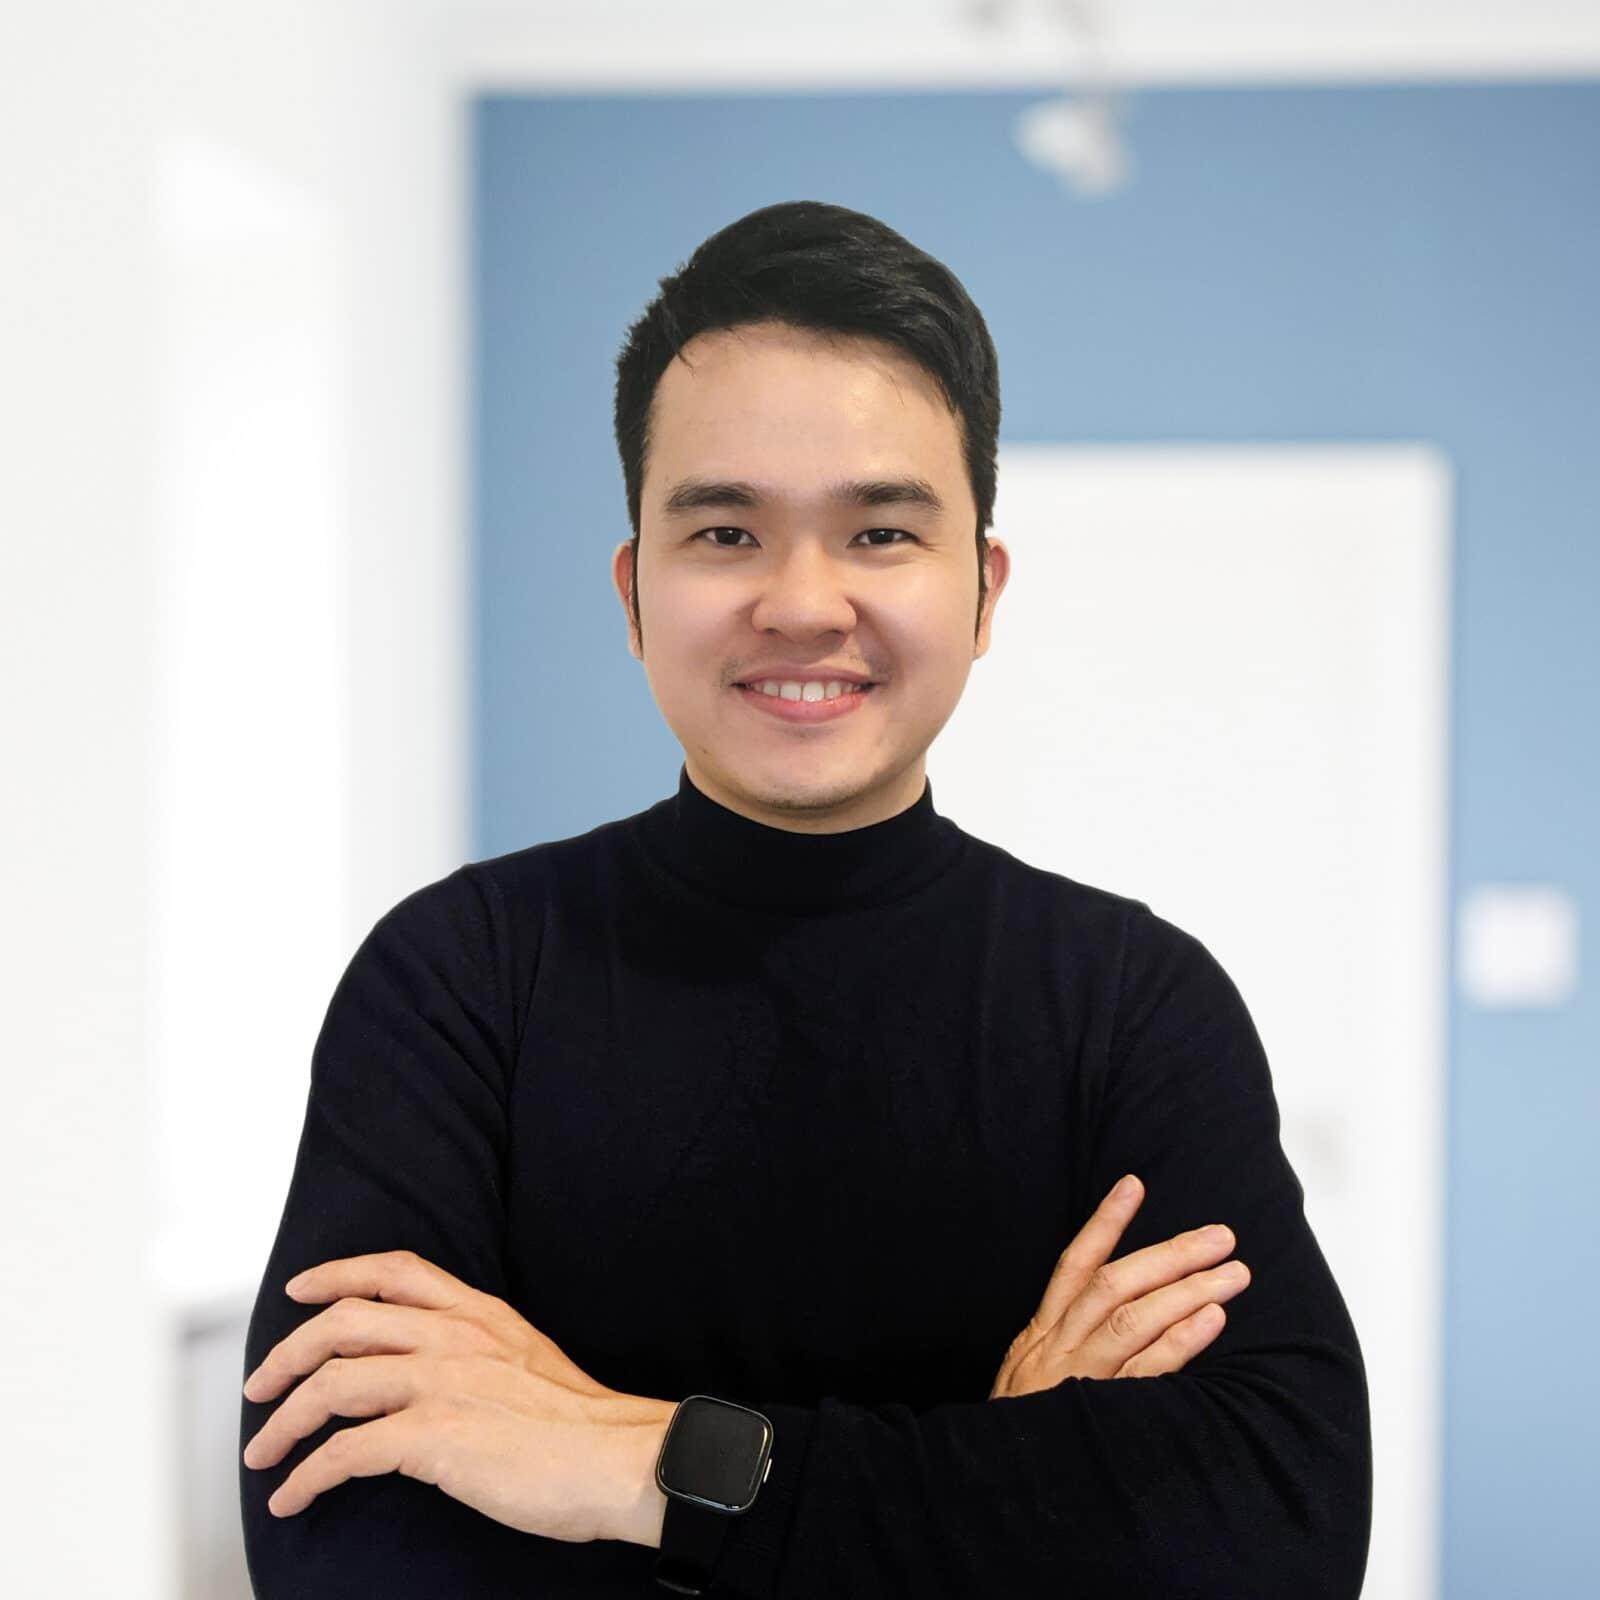 Thanh Nguyen Van